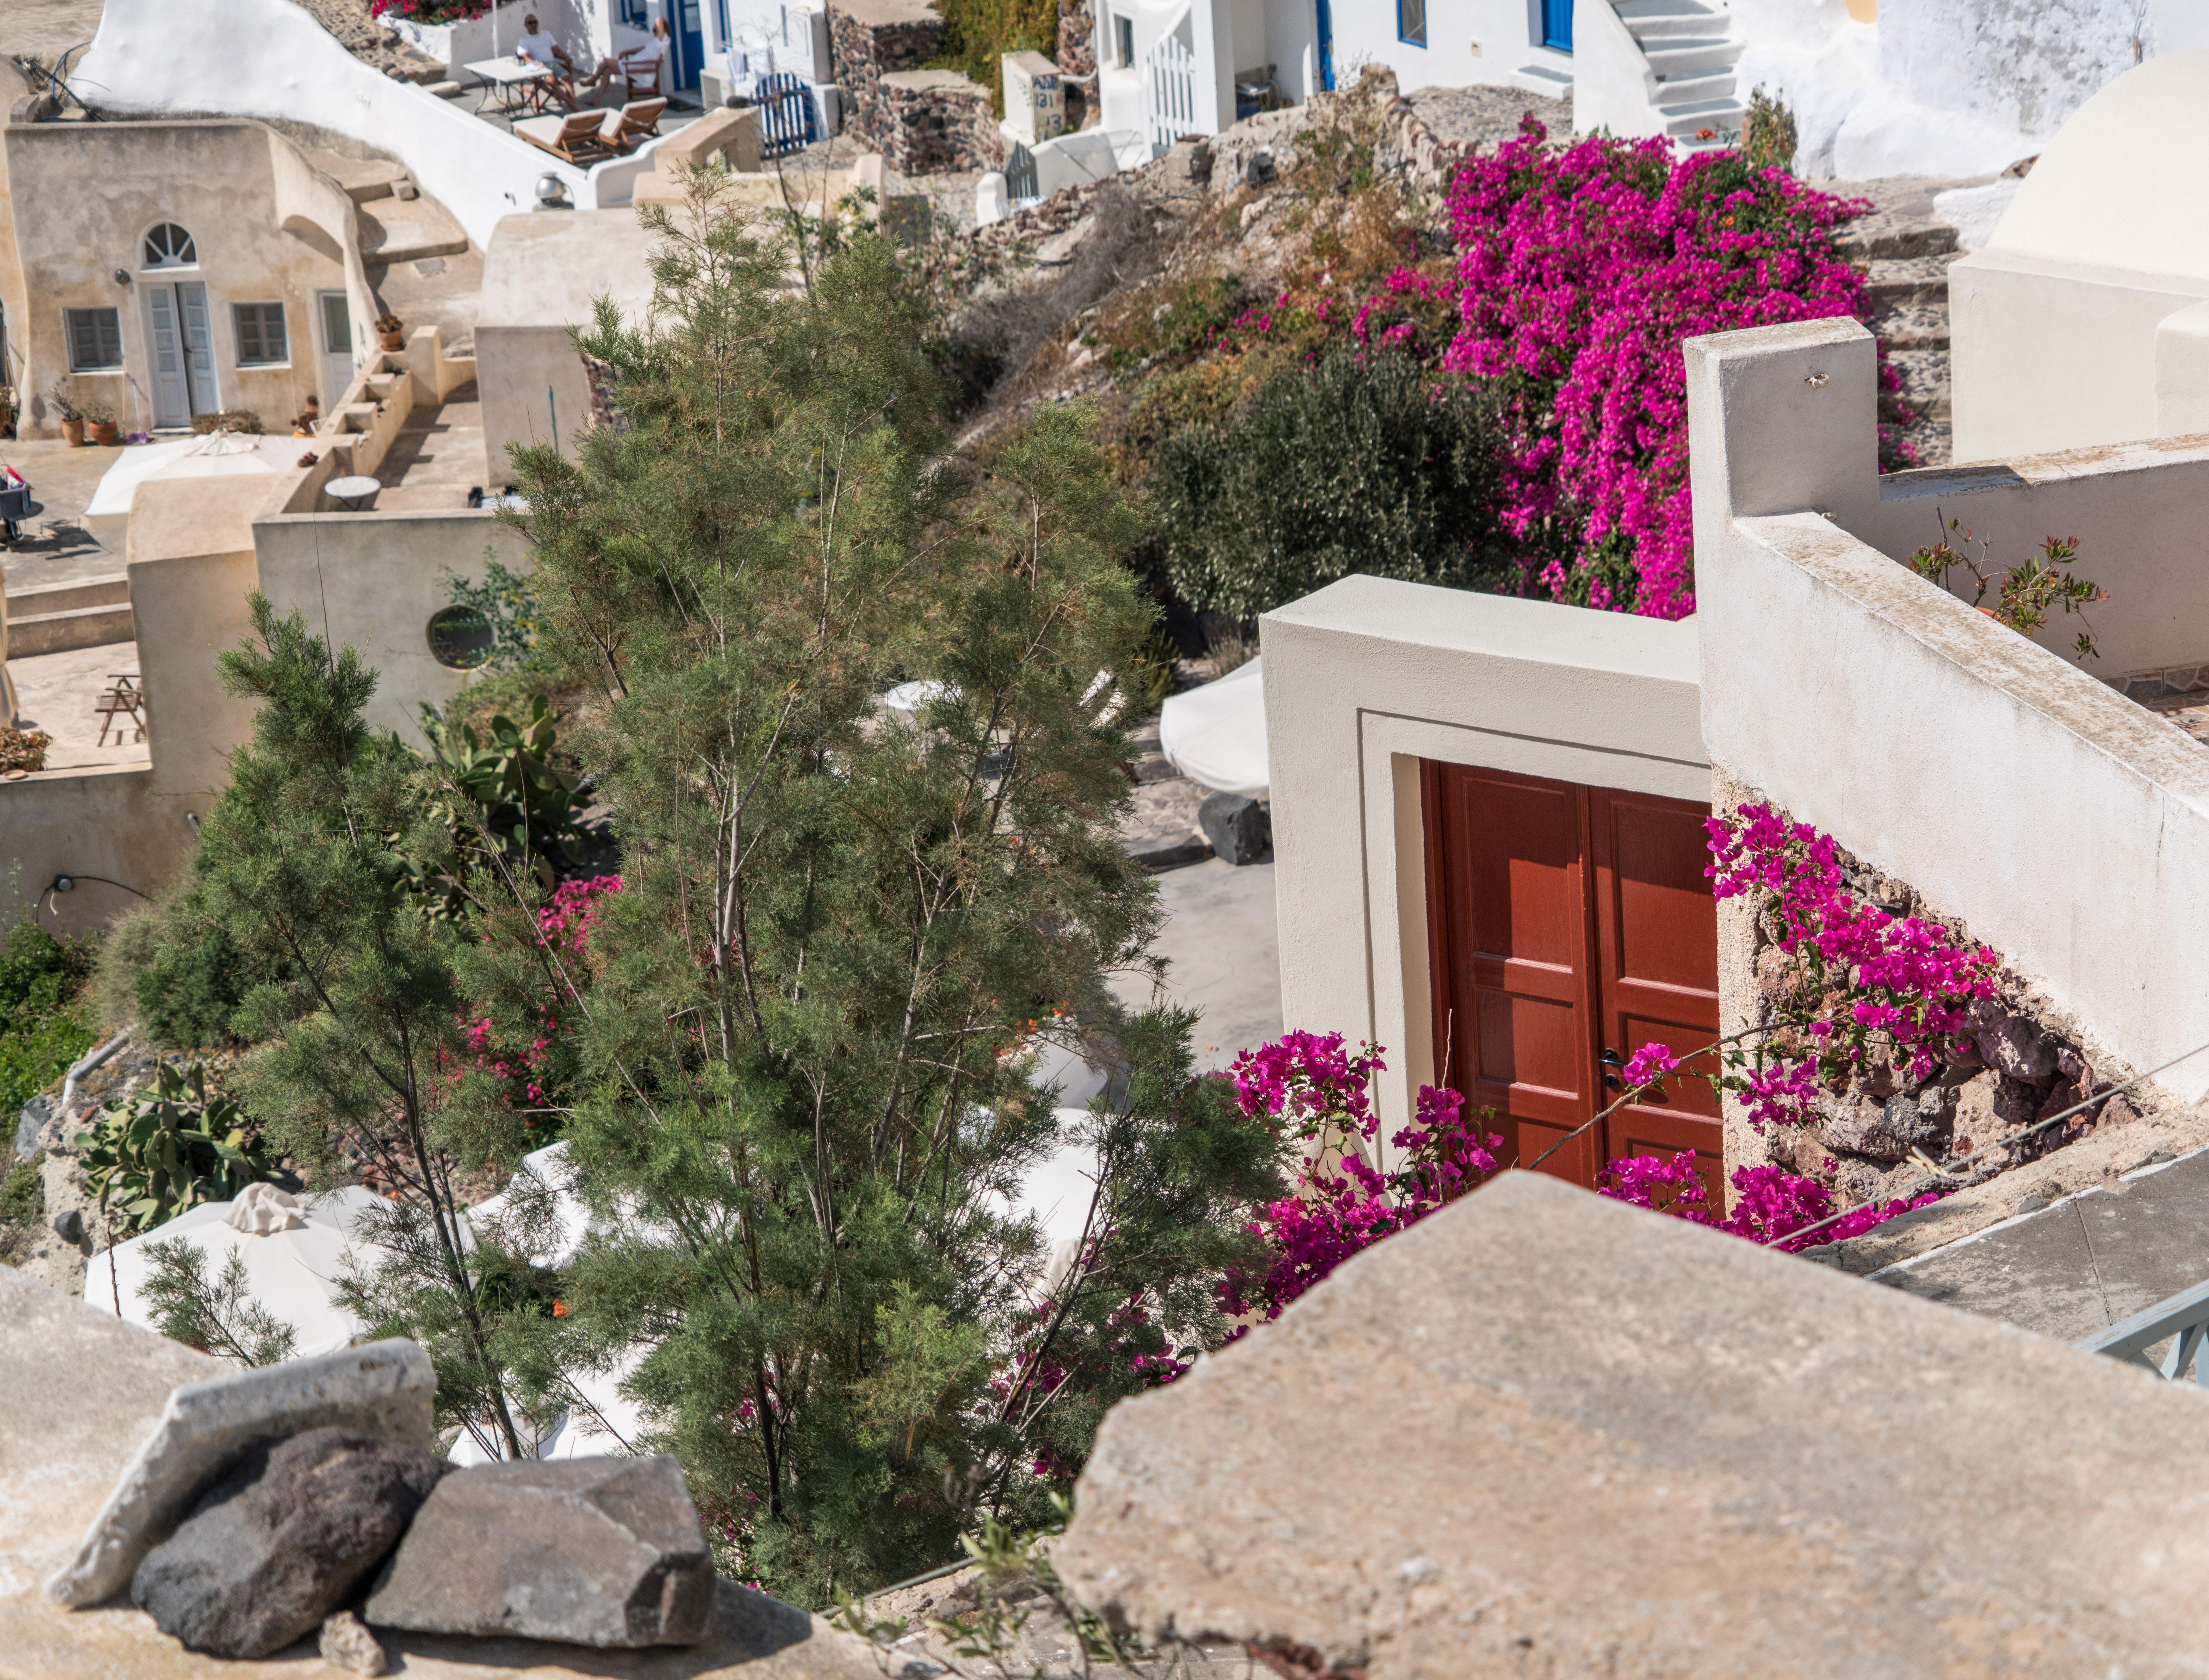 Free Images Landscape Architecture Sky White Villa Flower